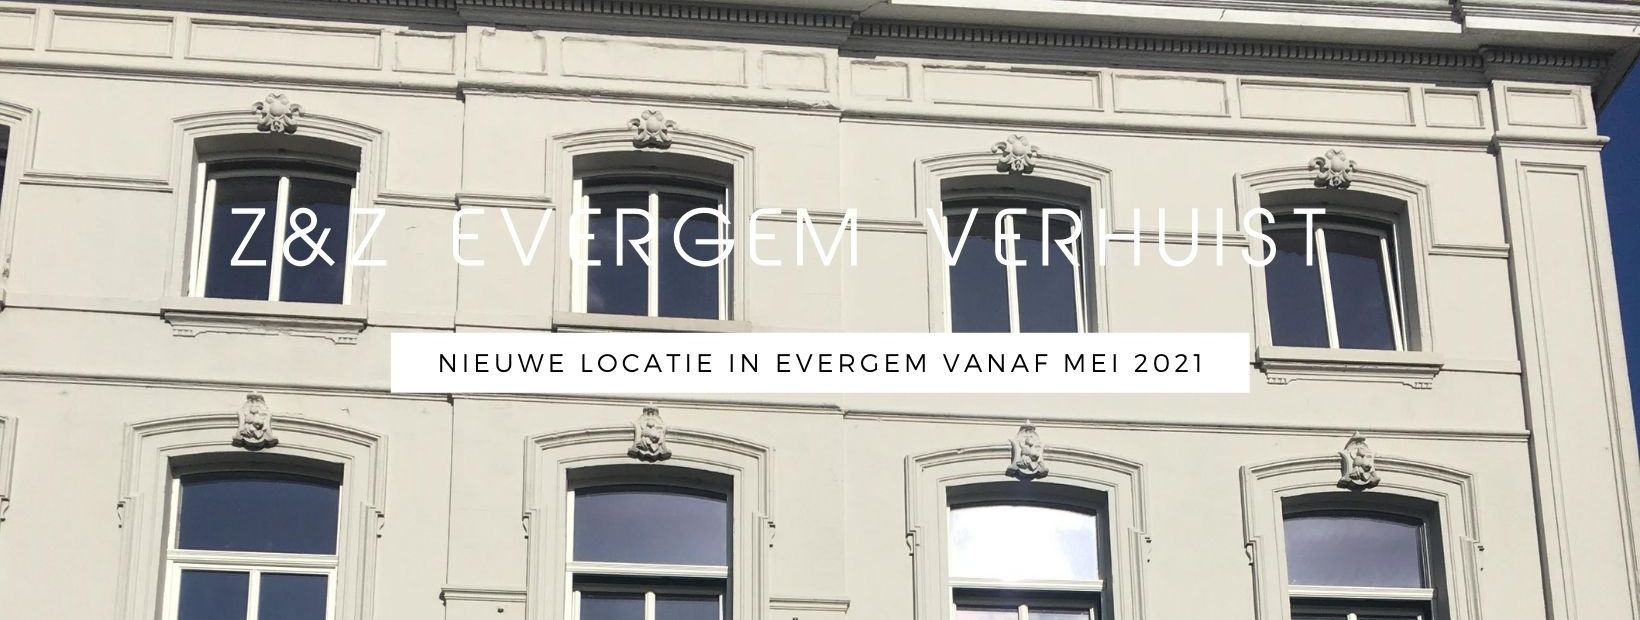 Z&Z Evergem verhuist